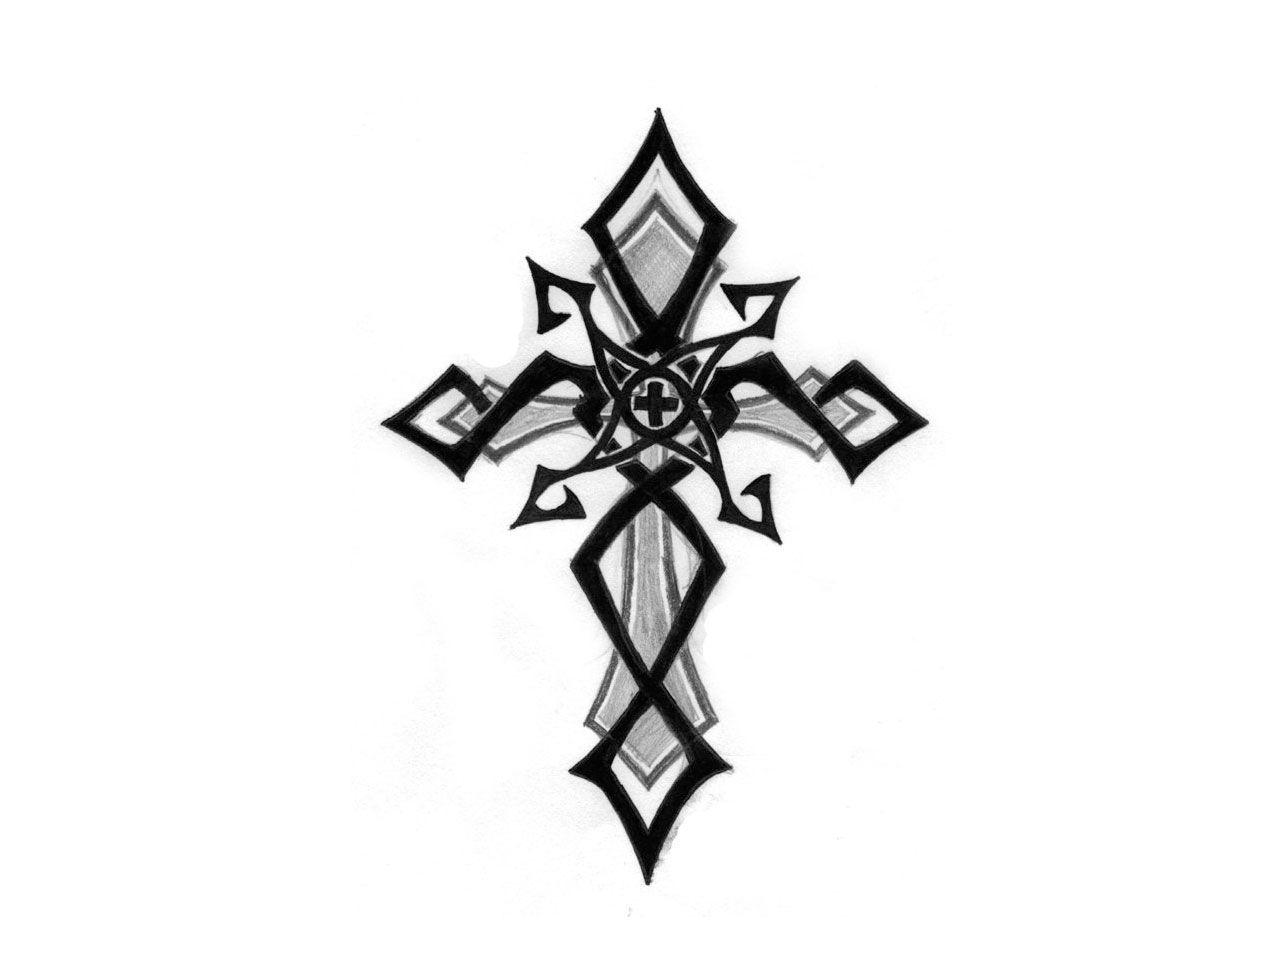 Small Tattoo Art: Free Designs - Penciled Tribal